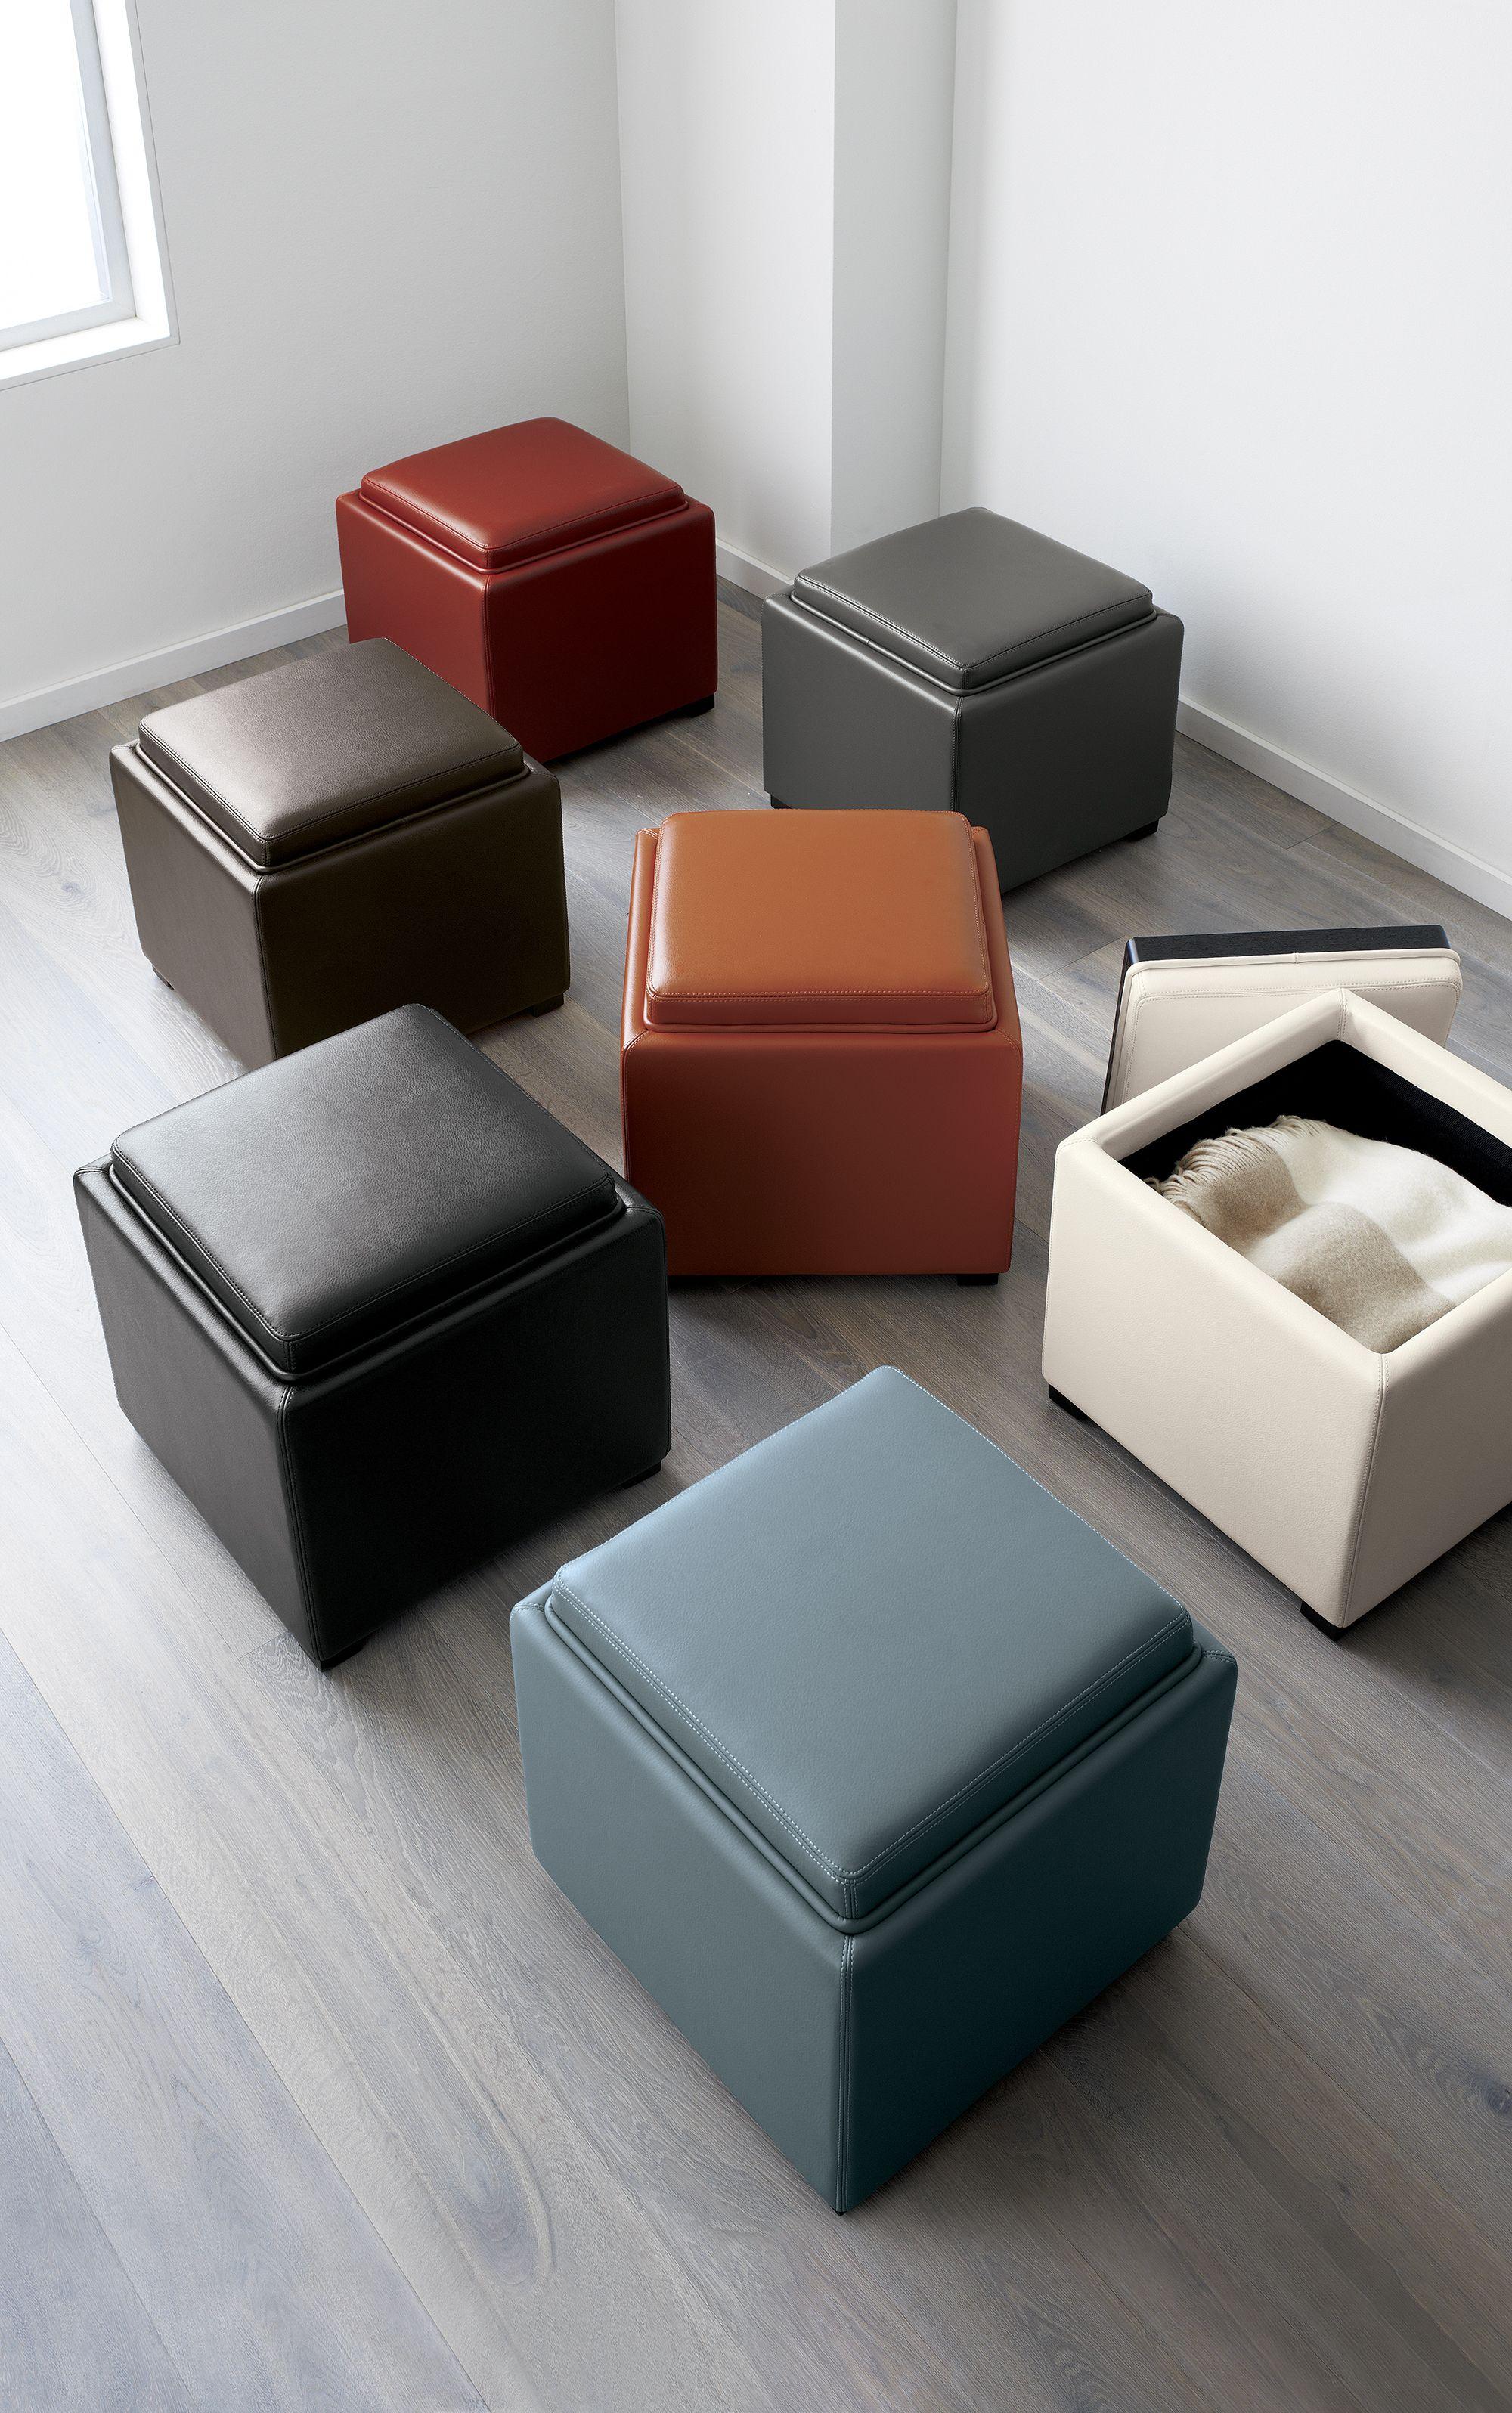 Stow Ocean 17 Leather Storage Ottoman Reviews Crate And Barrel Leather Storage Ottoman Storage Ottoman Storage Cube Ottoman